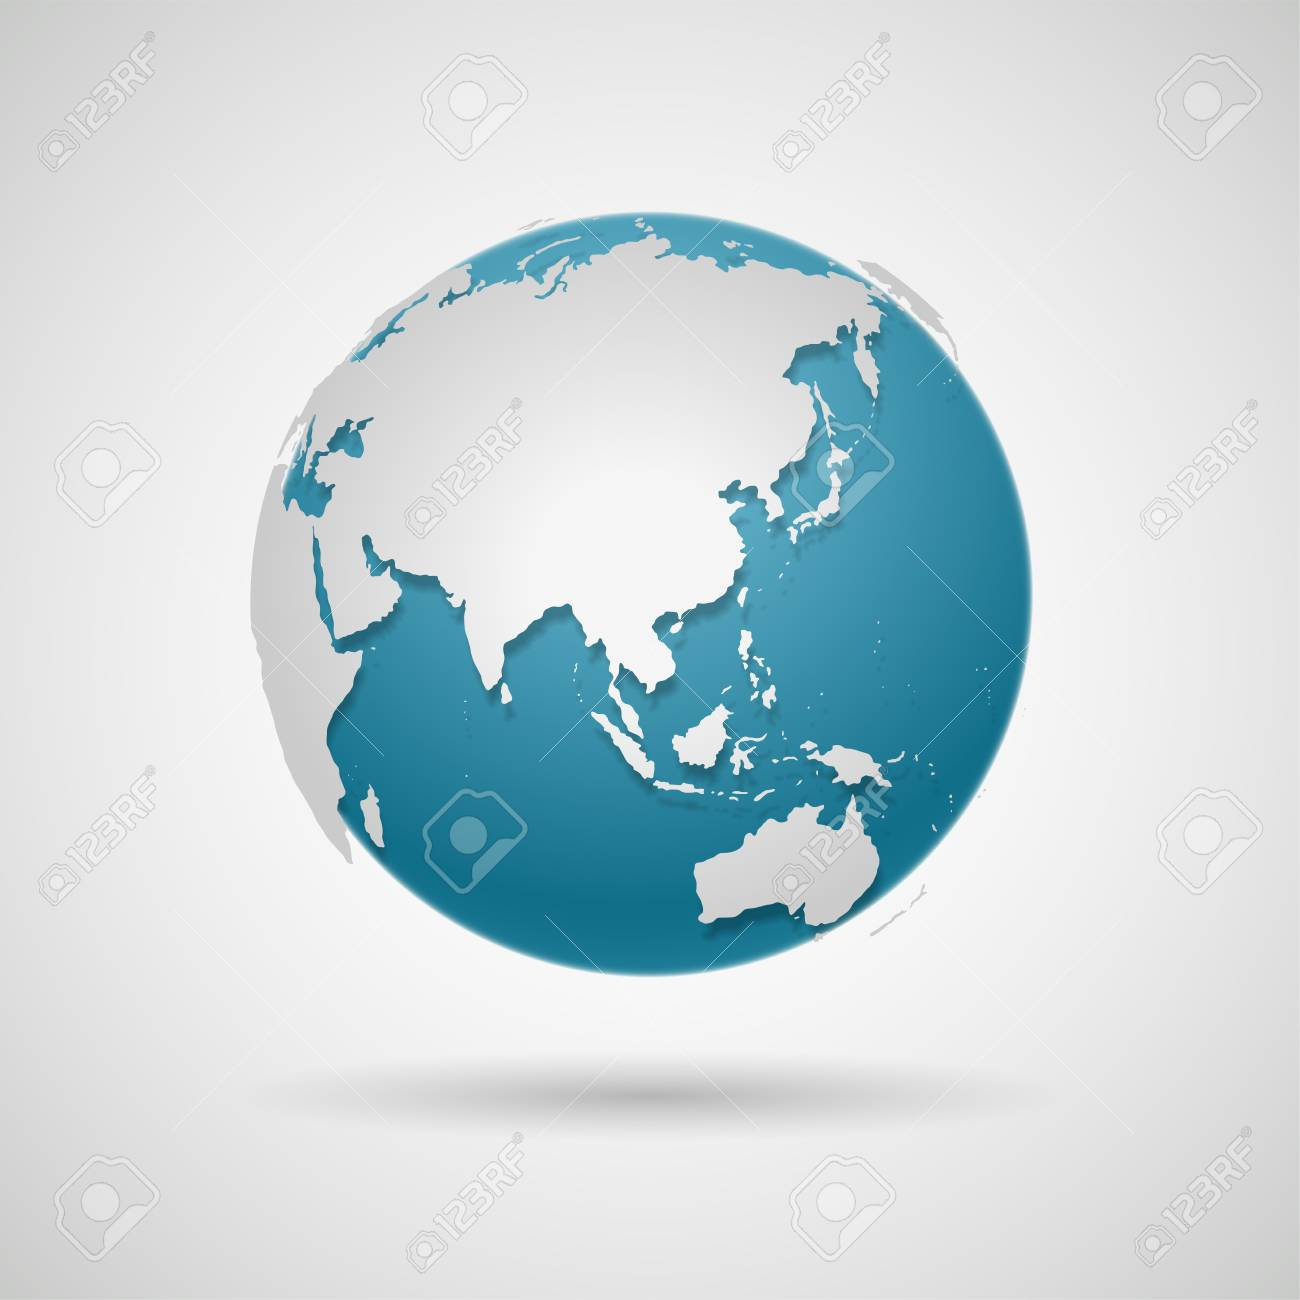 Globe Icon - Round World Map Vector Illustration - 128499751